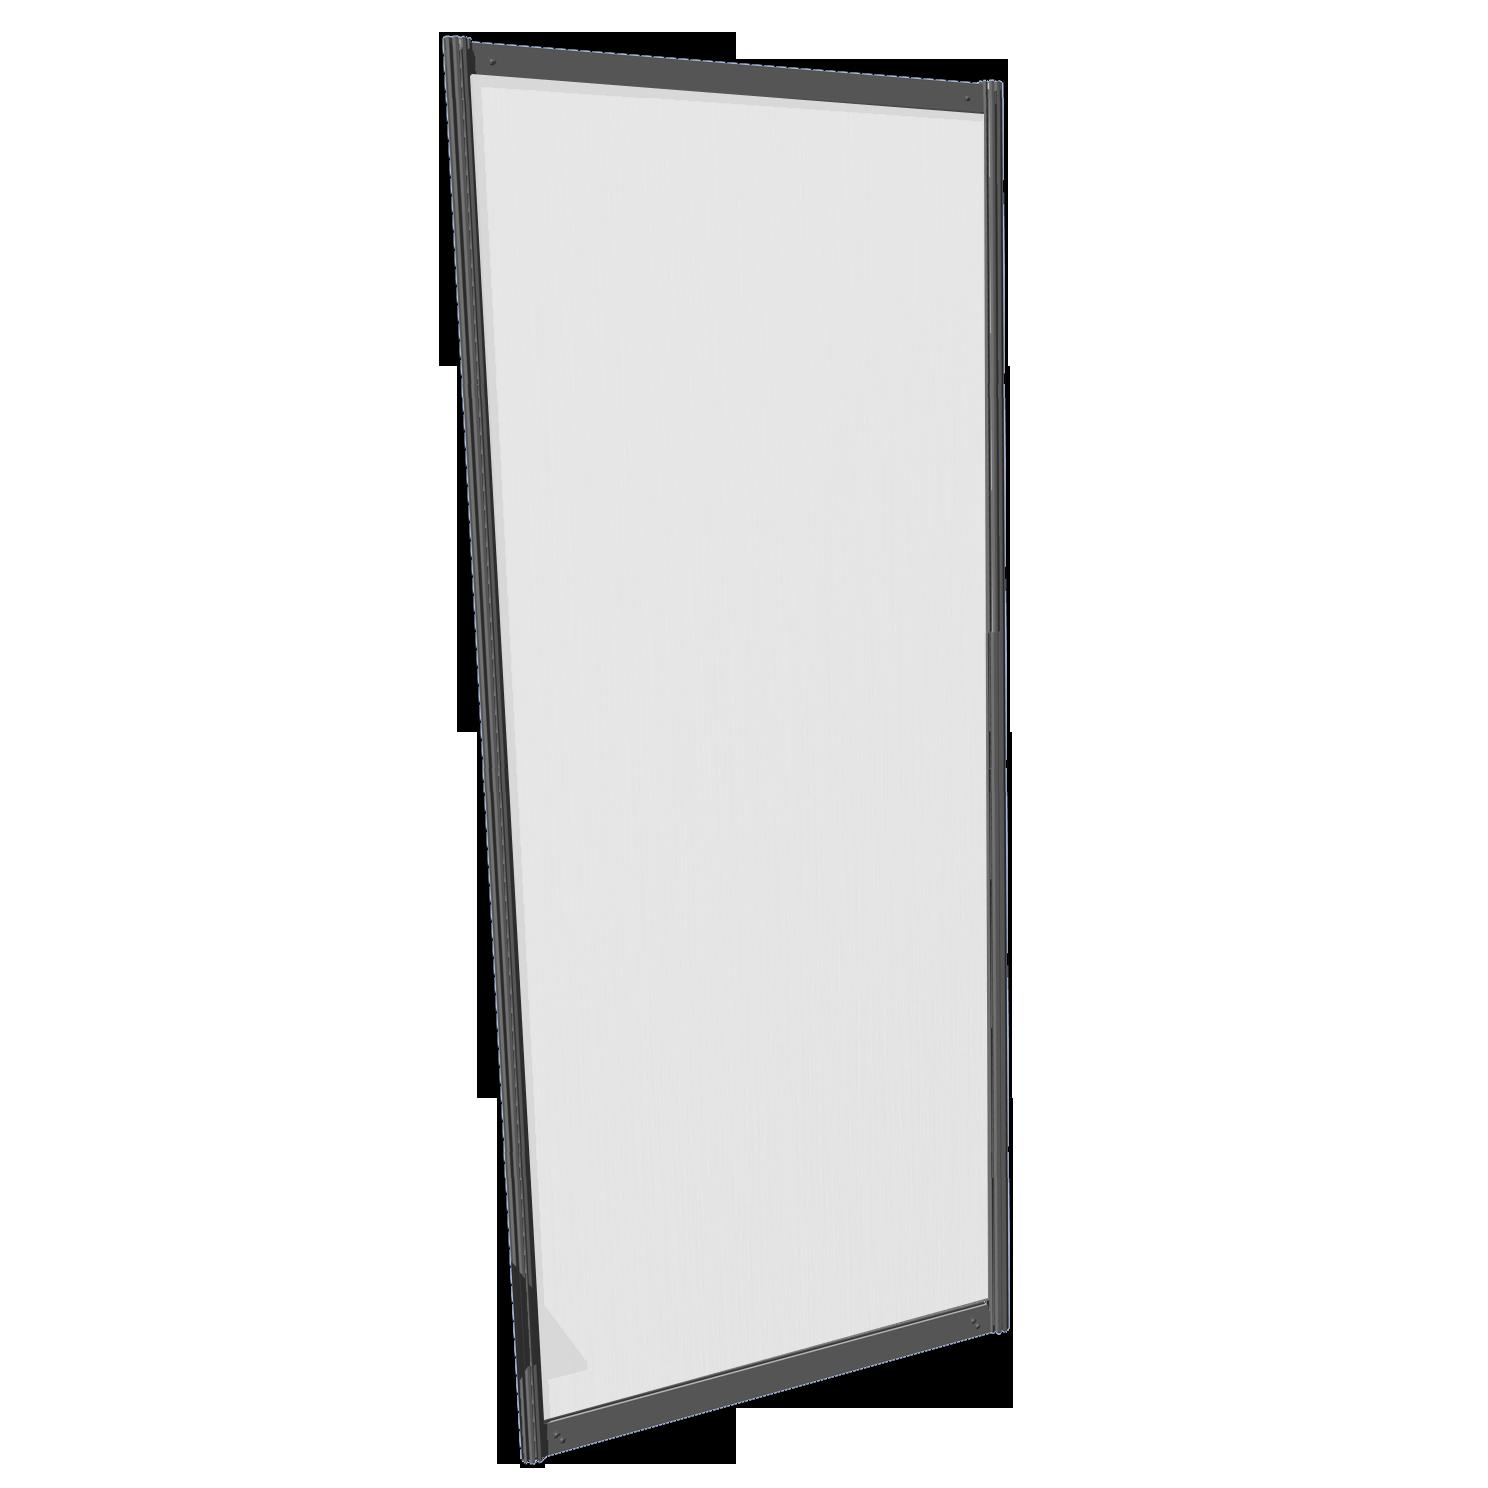 Stellwand / Trennwand / Rückwand 100cm